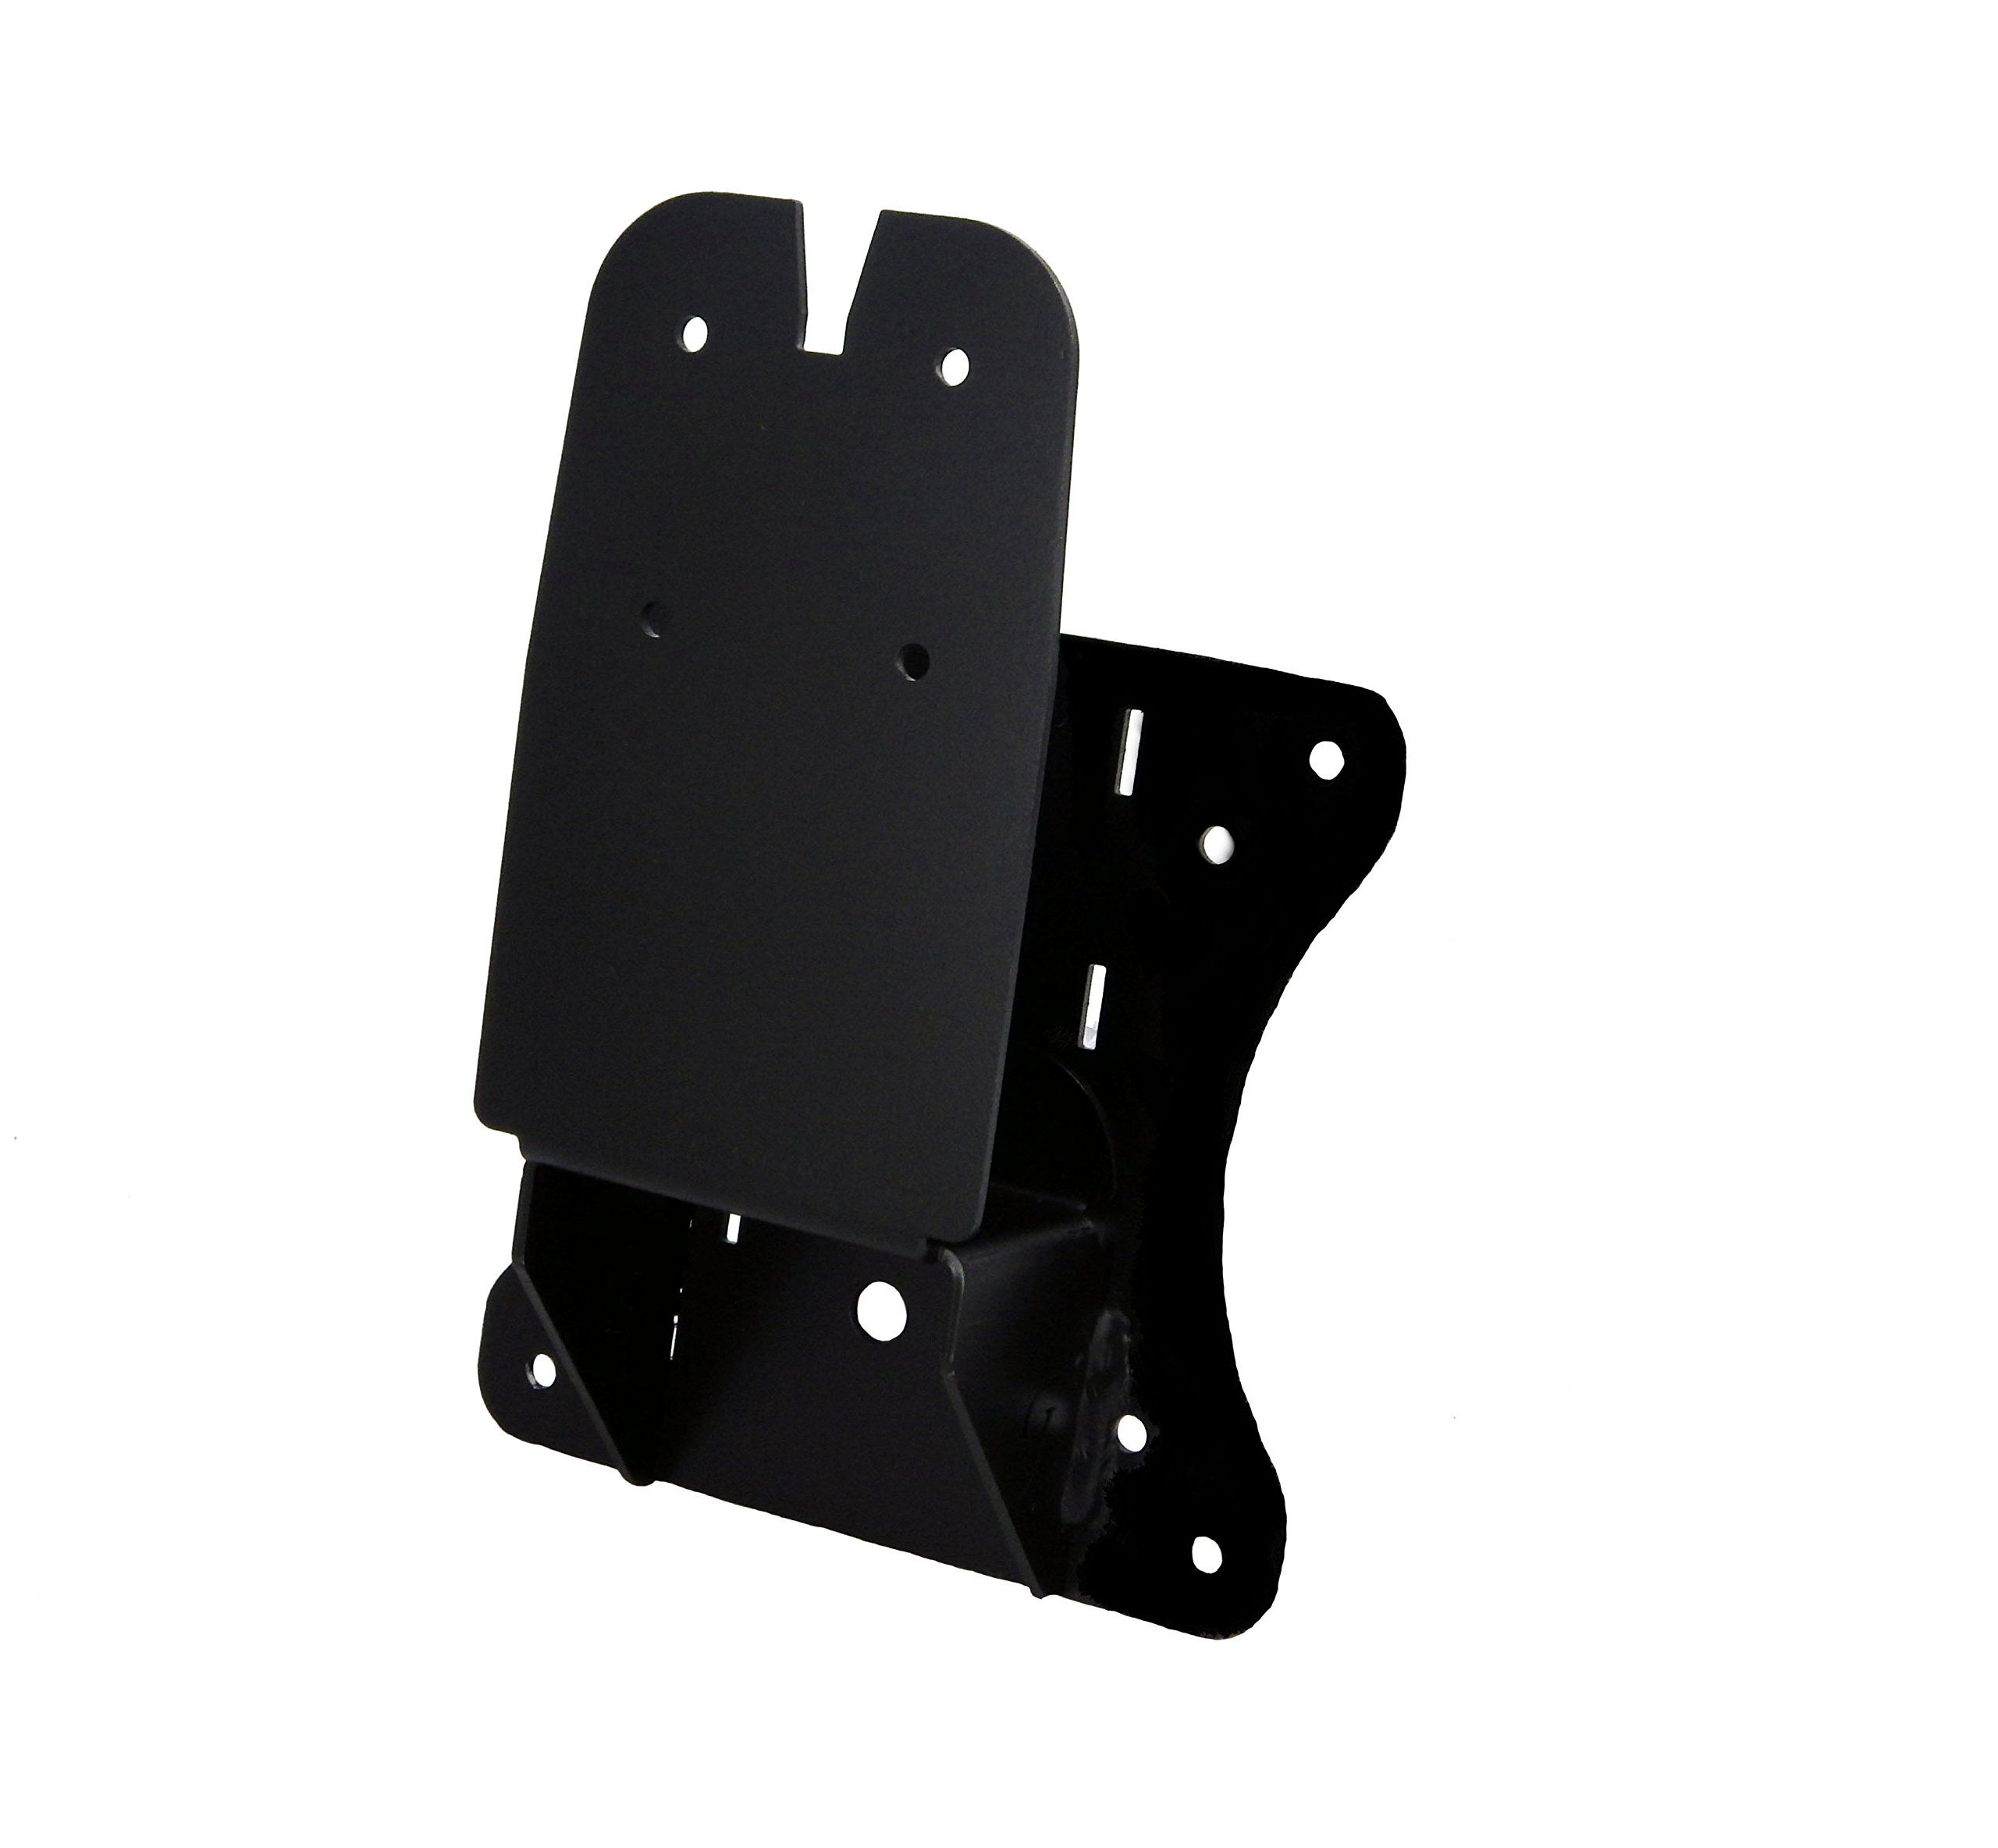 Dell VESA BRACKET ADAPTER Wall Mount for: Dell SX2210 ...